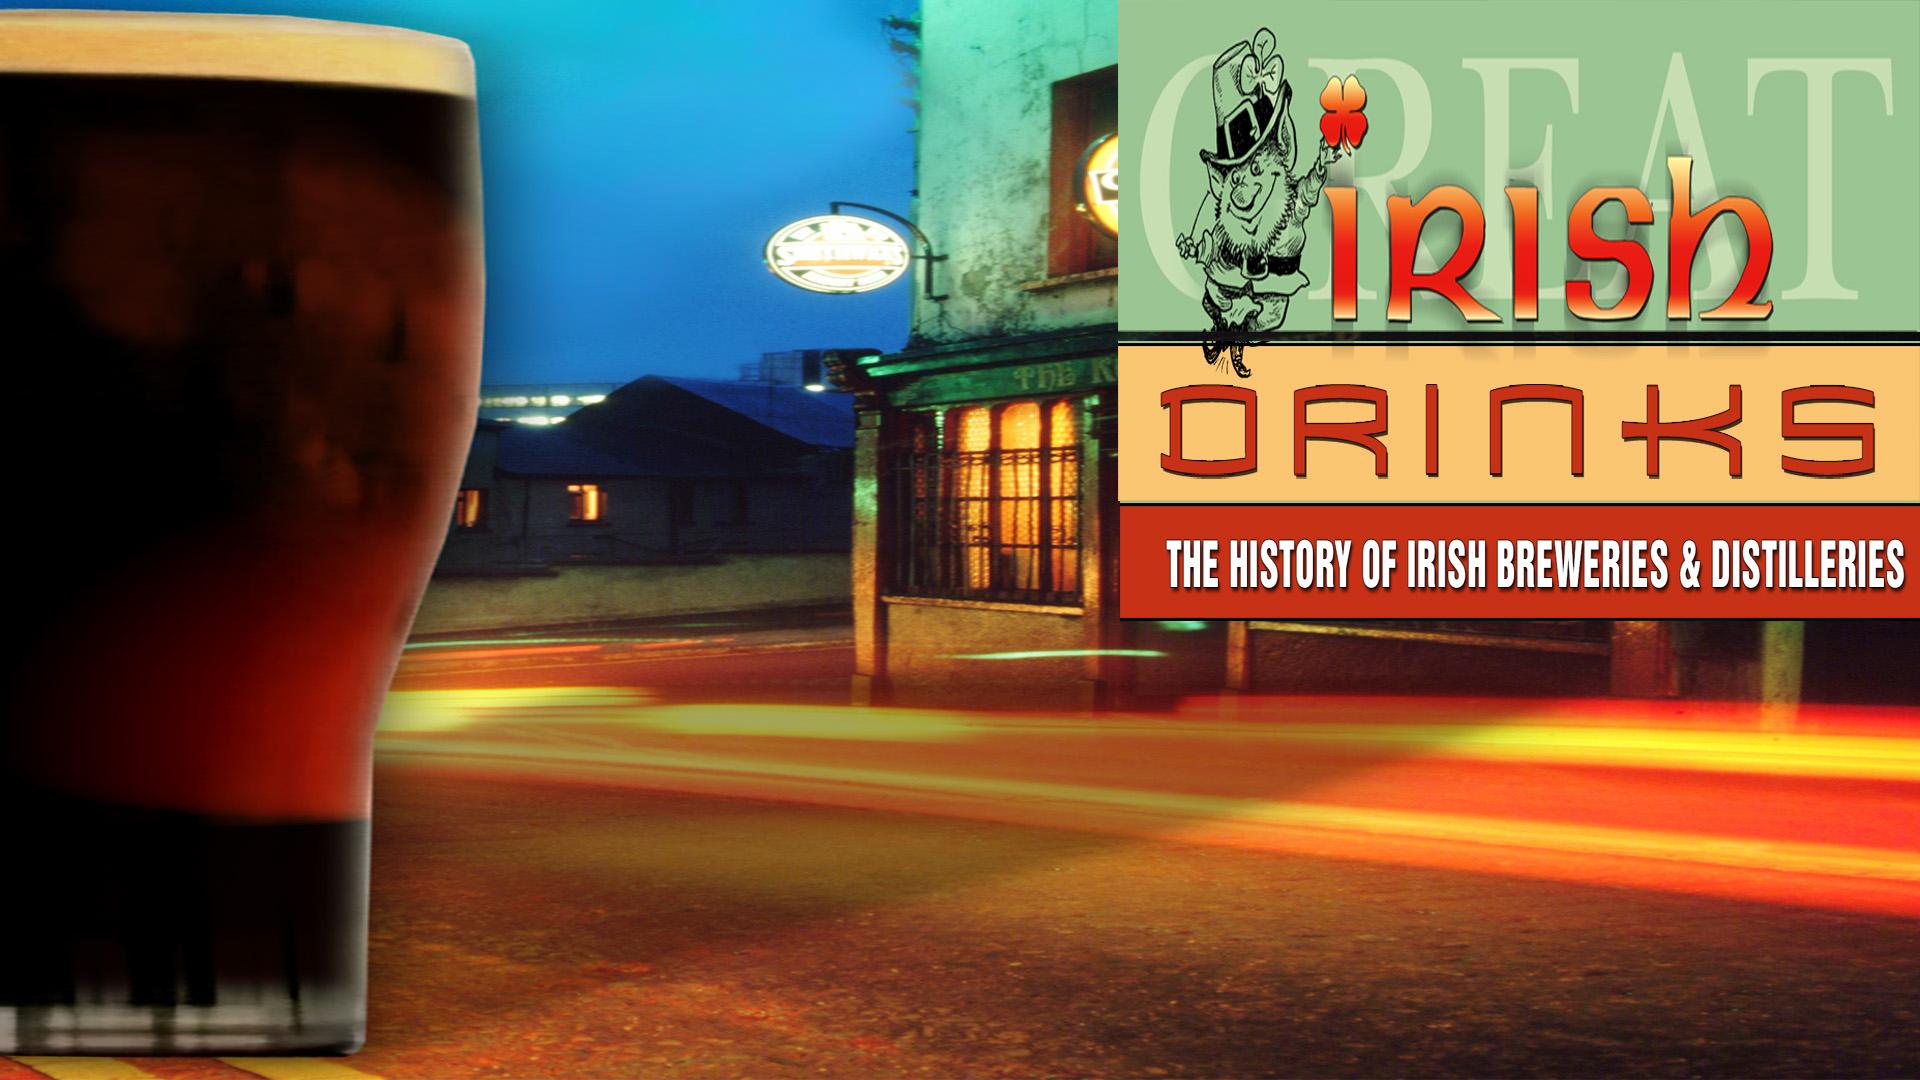 Great Irish Drinks: The History of Irish Breweries & Distilleries